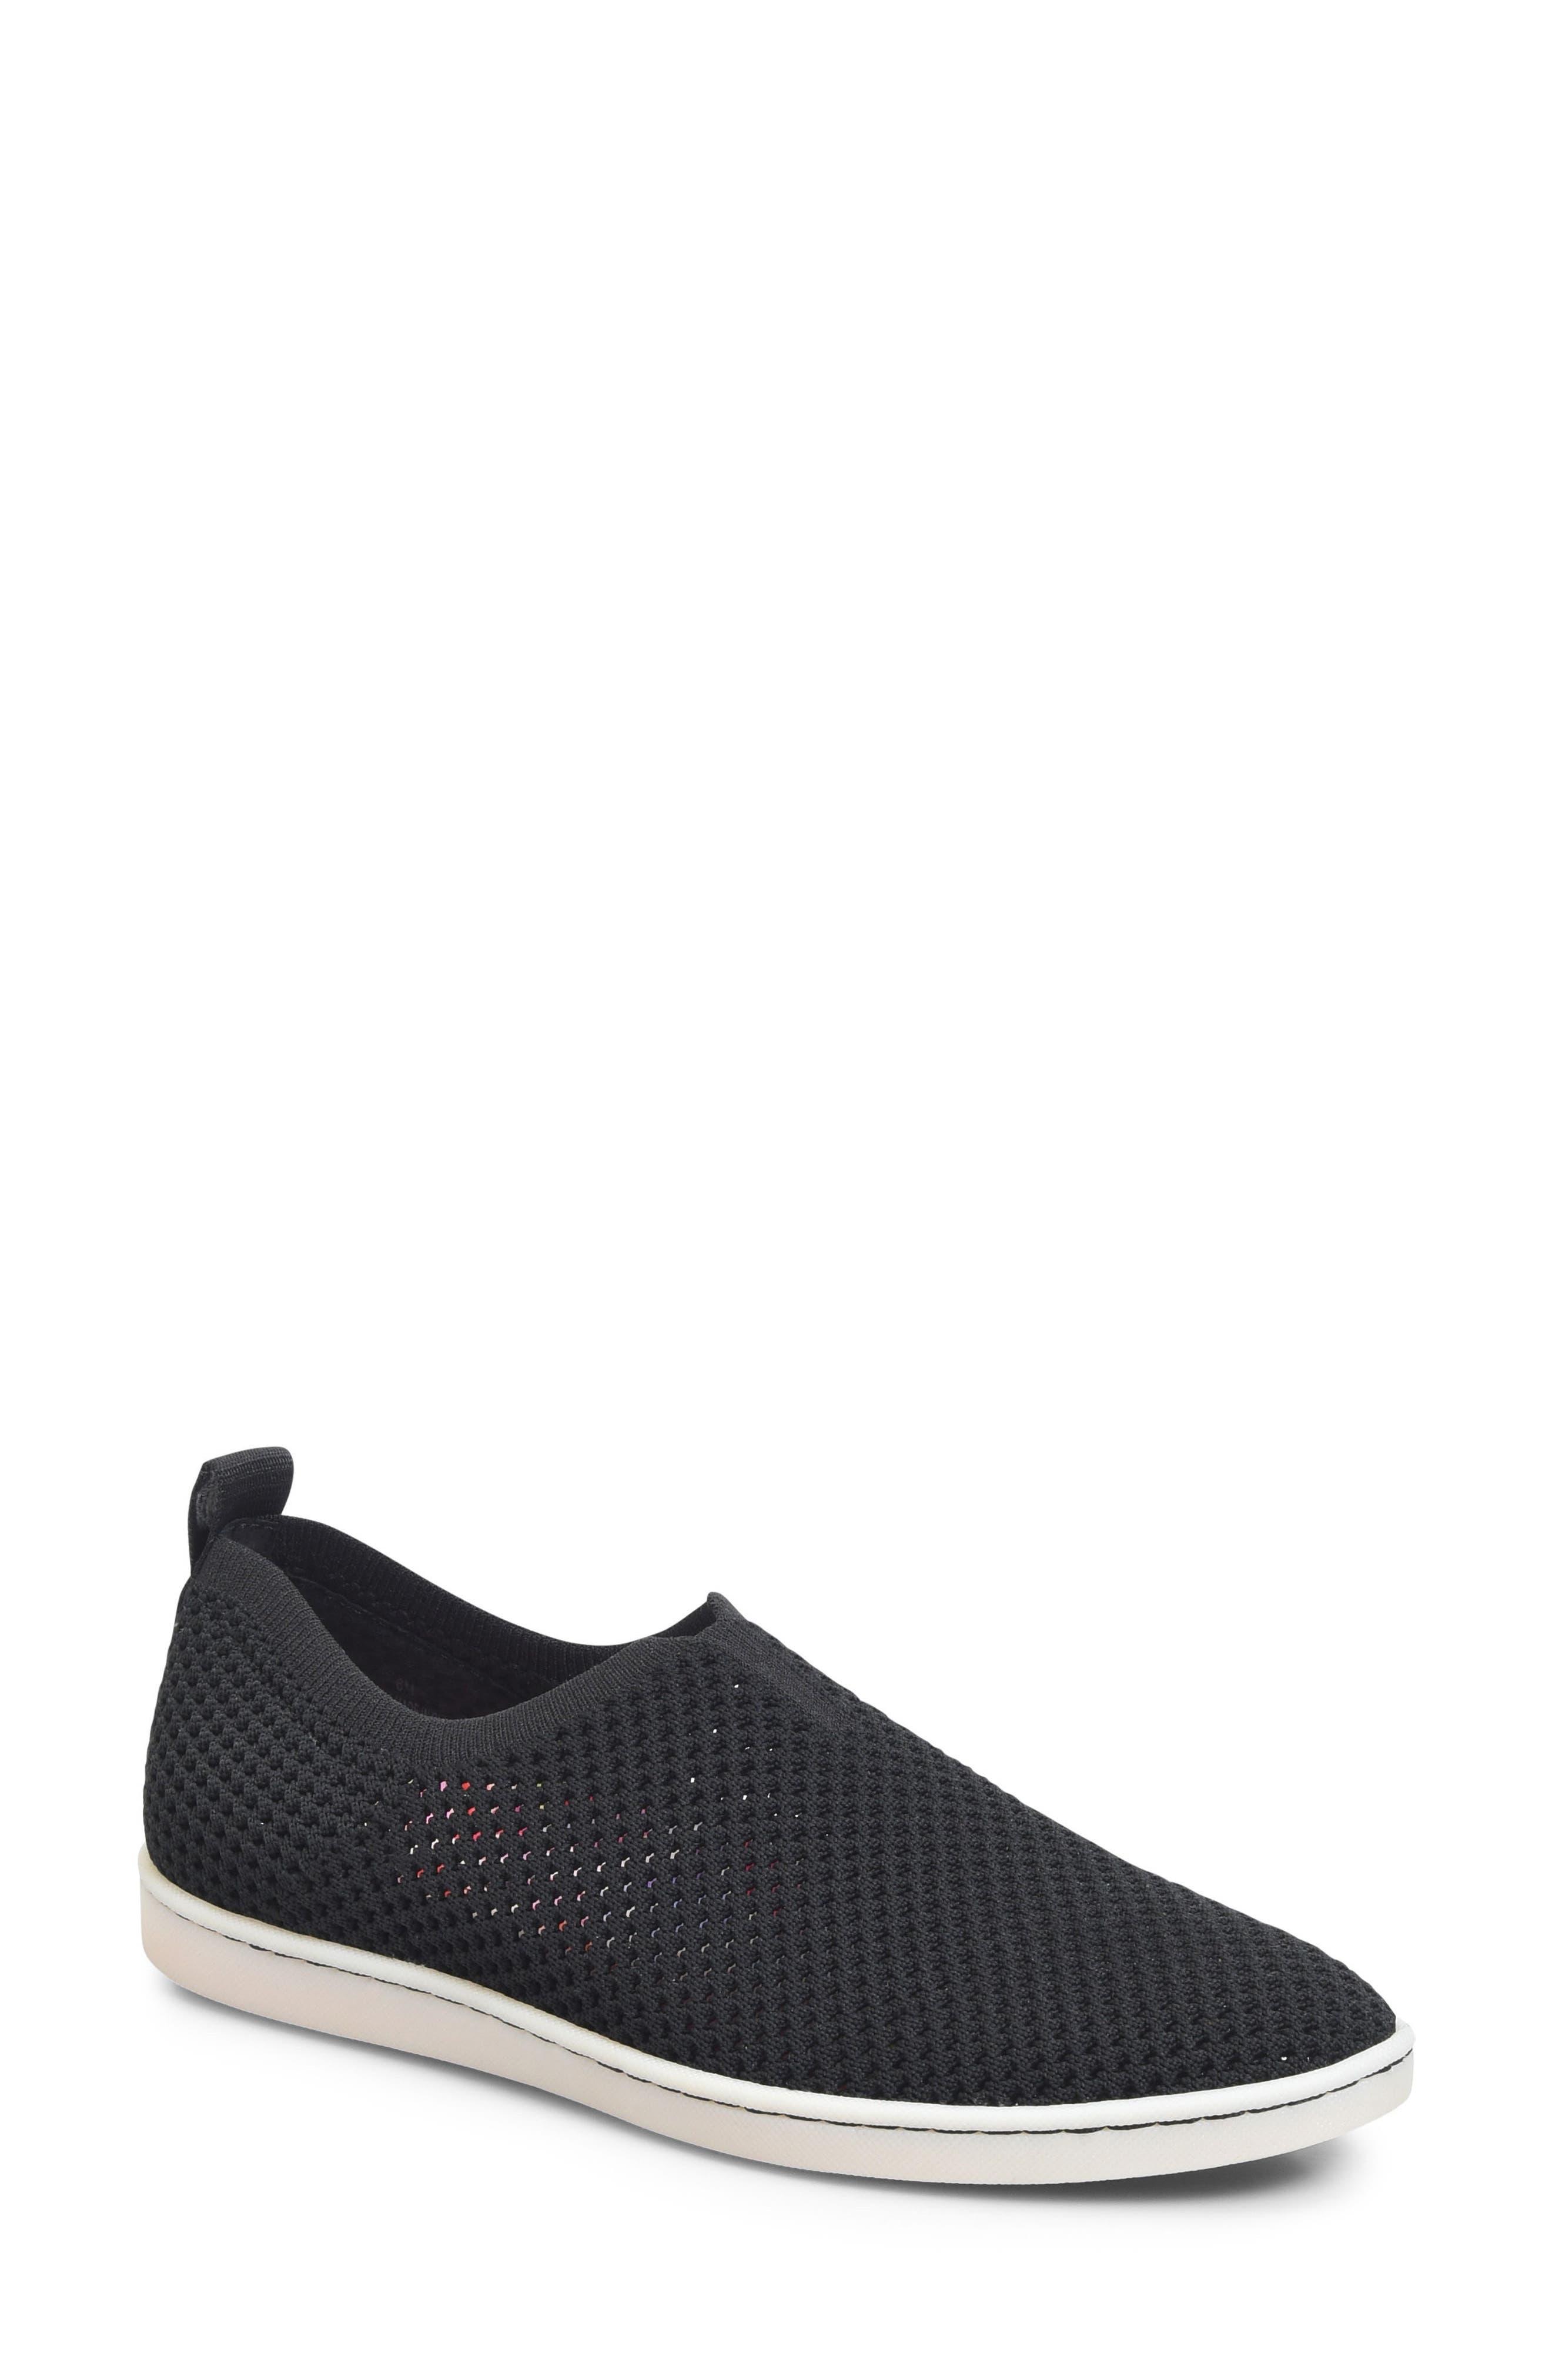 Hazy Slip-On Sneaker,                             Main thumbnail 1, color,                             Black Fabric